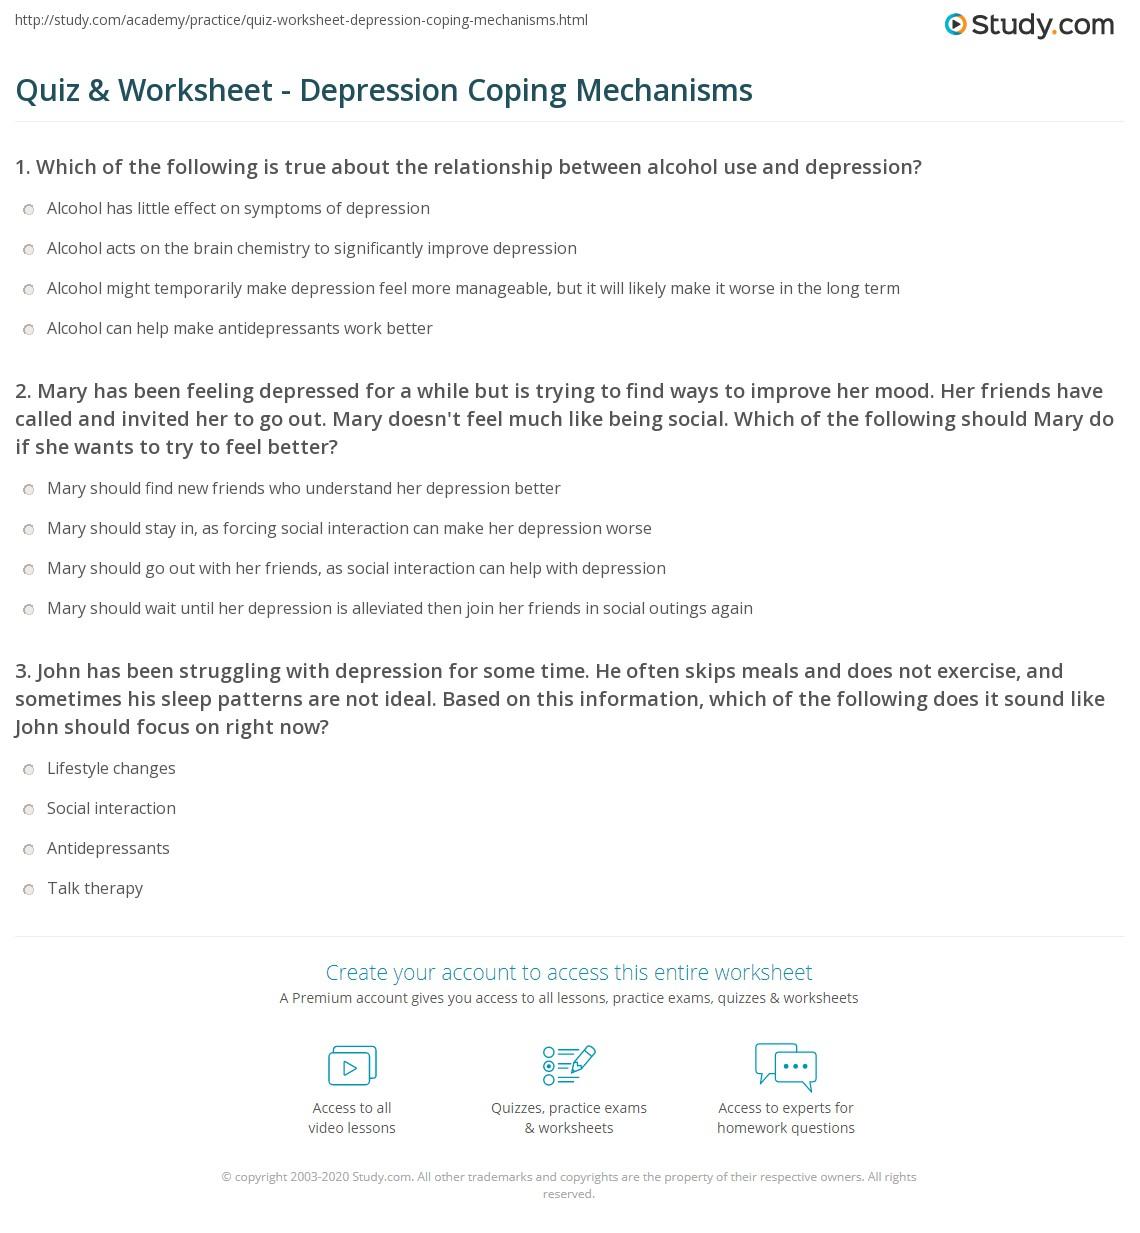 Coping Mechanisms Worksheet